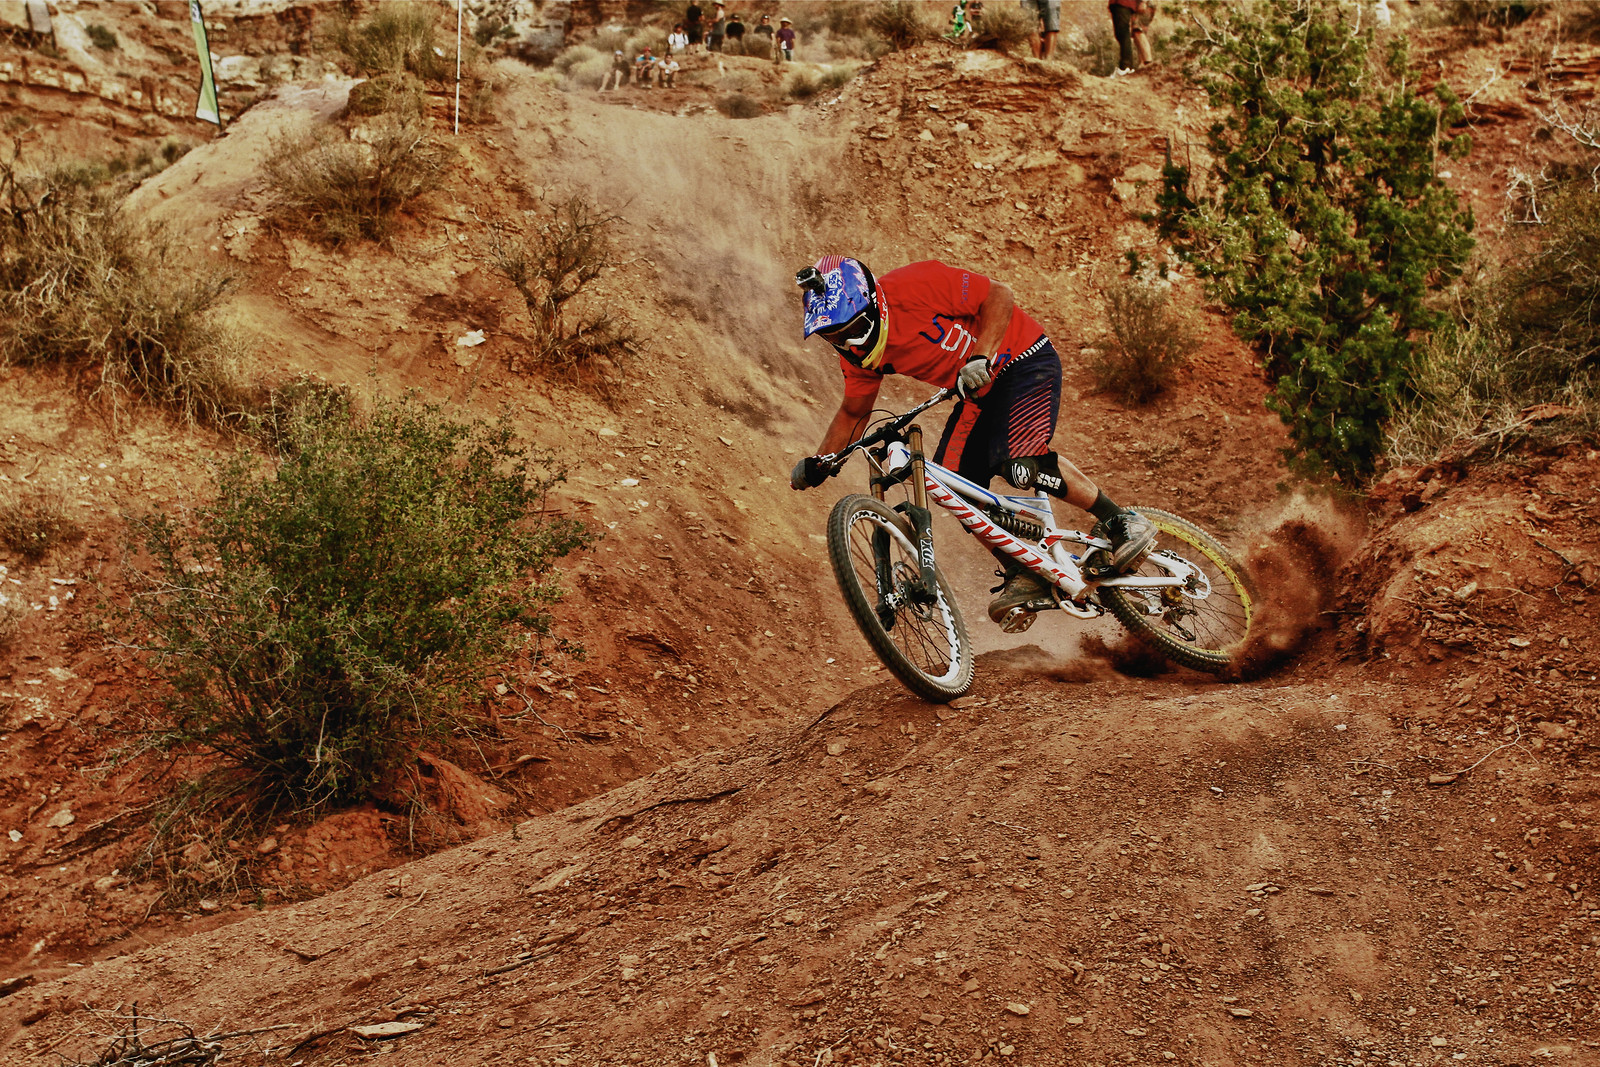 Darren Berrecloth  - Malcolm Mclaws - Mountain Biking Pictures - Vital MTB